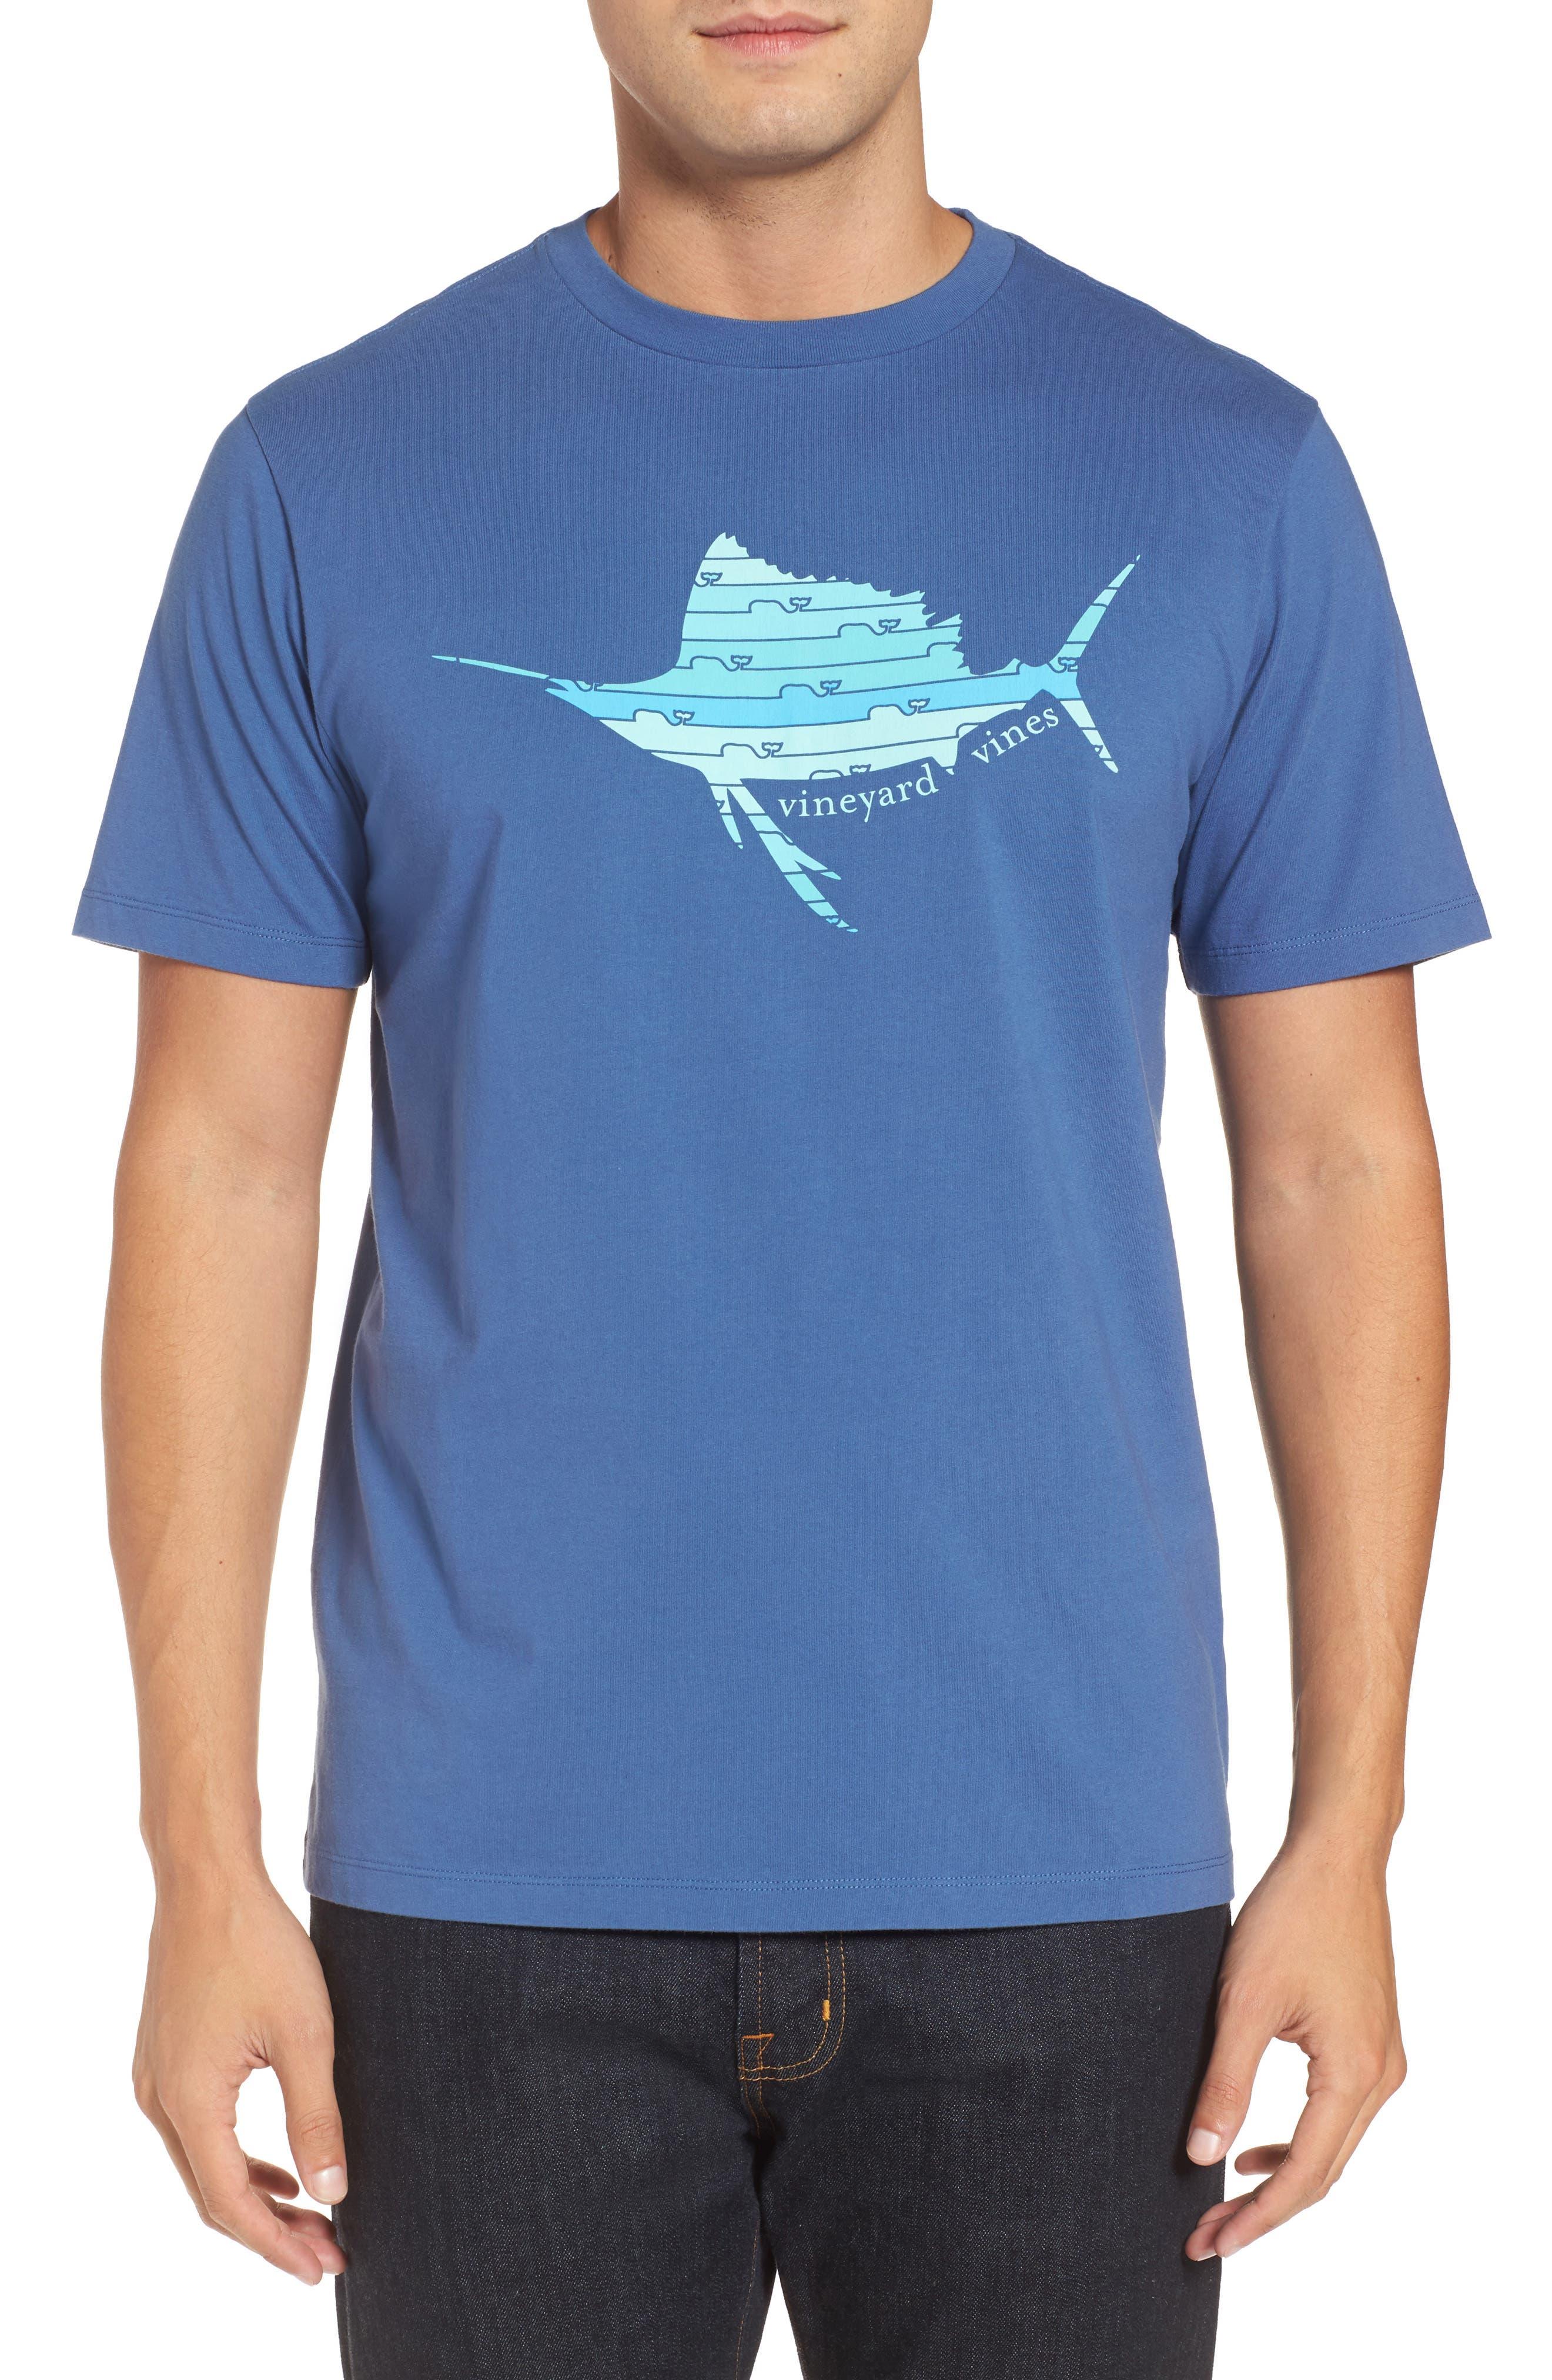 Alternate Image 1 Selected - vineyard vines Sailfish Whale Line Graphic T-Shirt